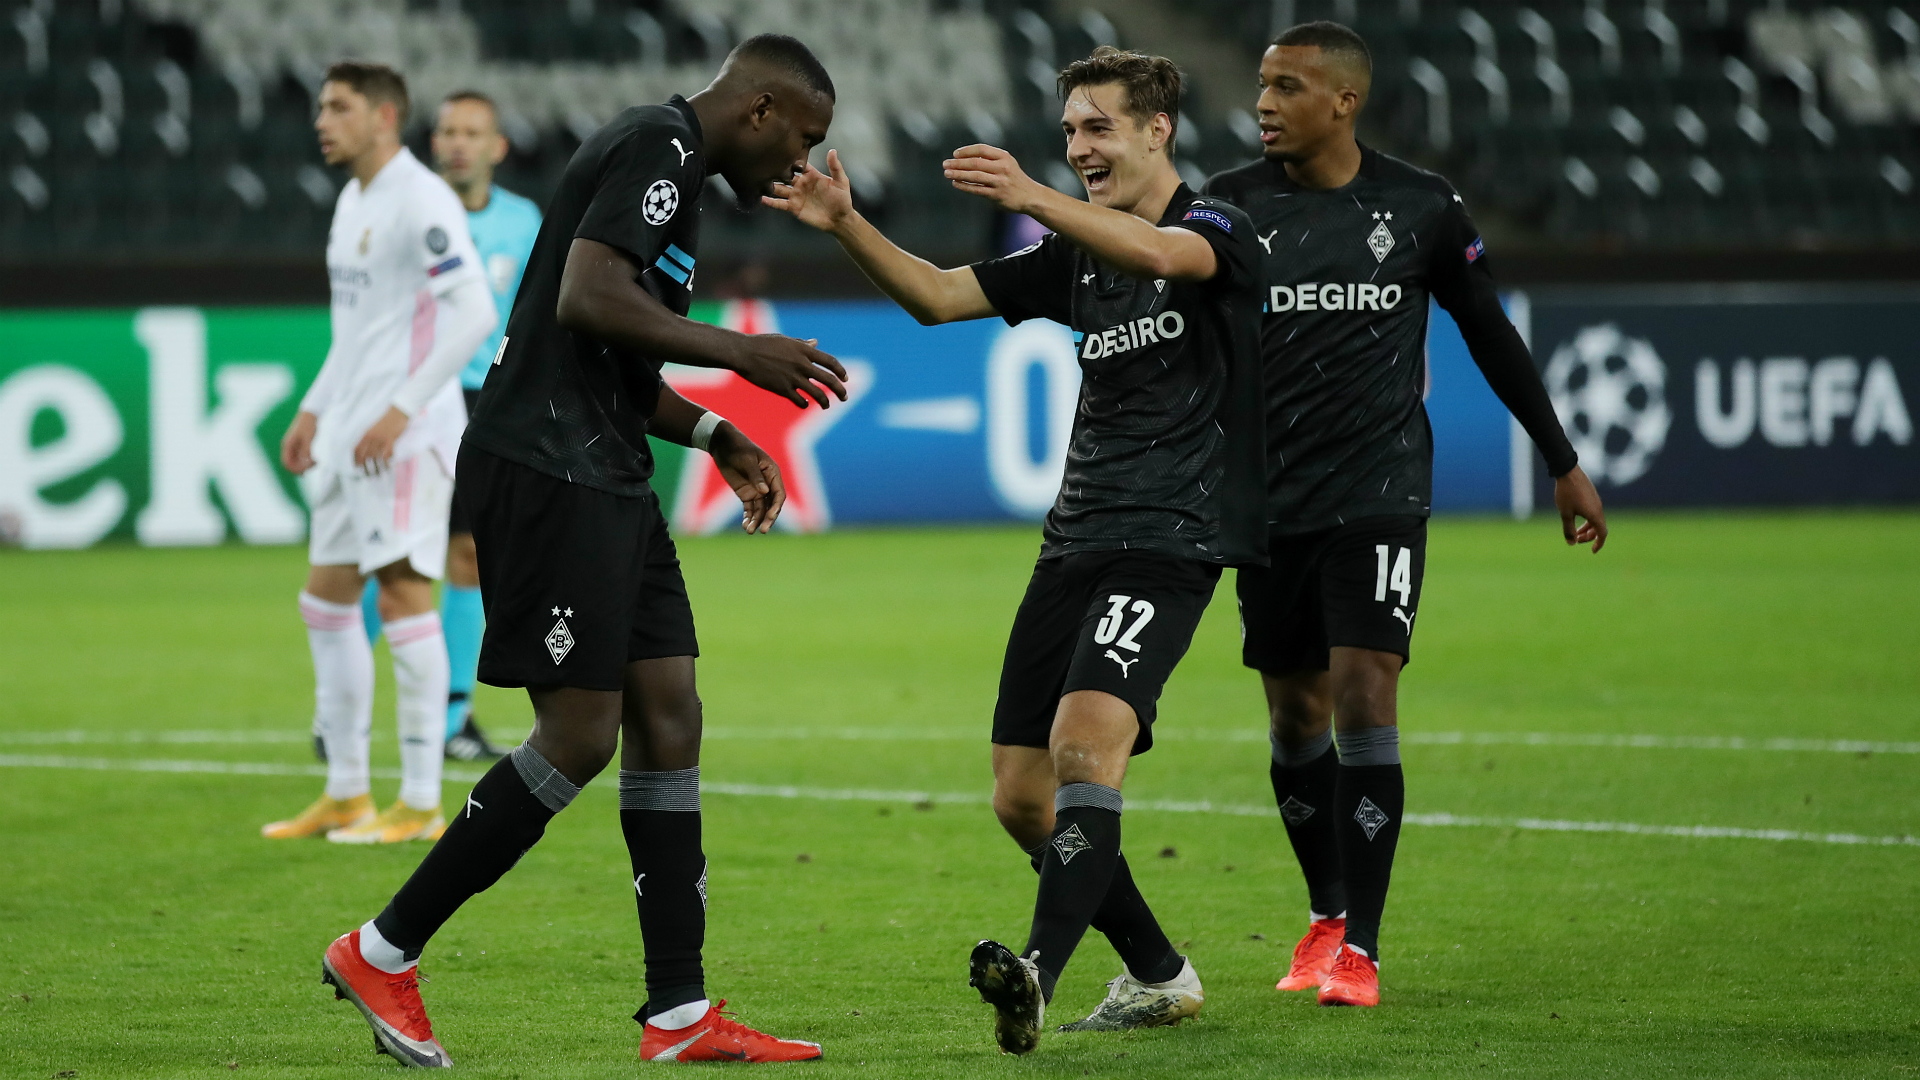 Borussia M'gladbach v Real Madrid Match Report, 27/10/2020, UEFA Champions League | Goal.com